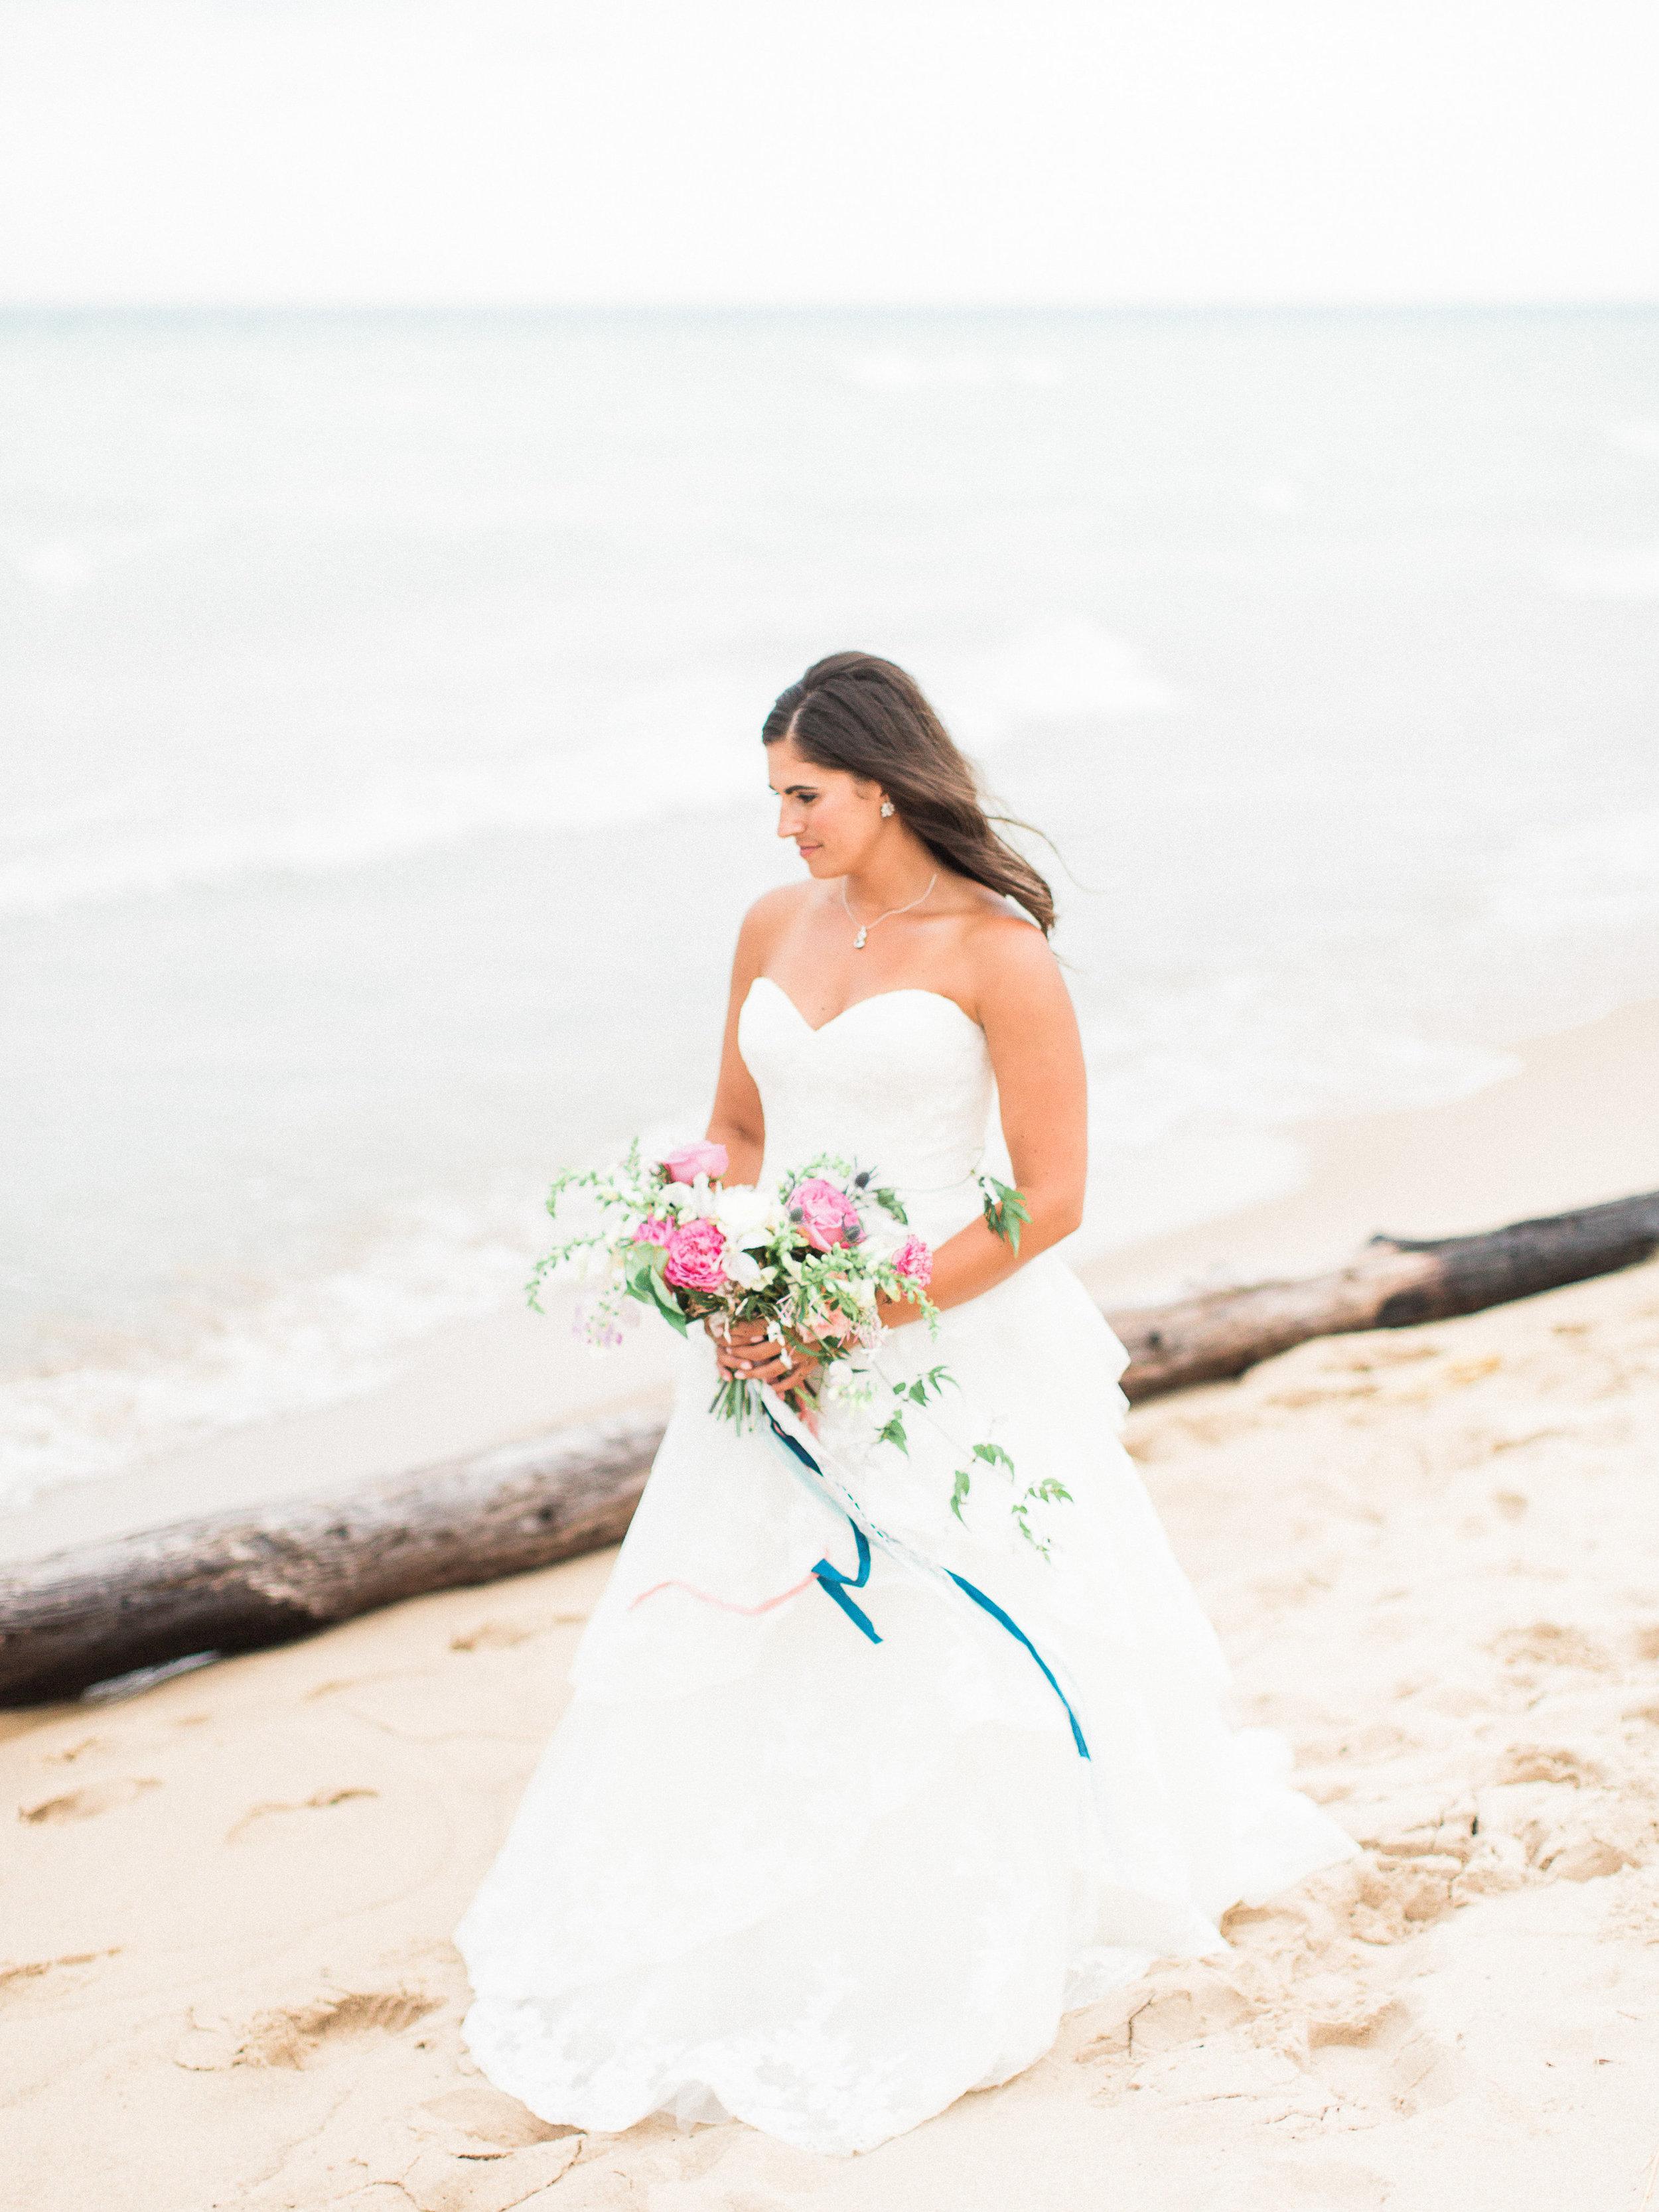 ERIC AND HALLIE WEDDING-HI RESOLUTION FOR PRINTING-0731.jpg